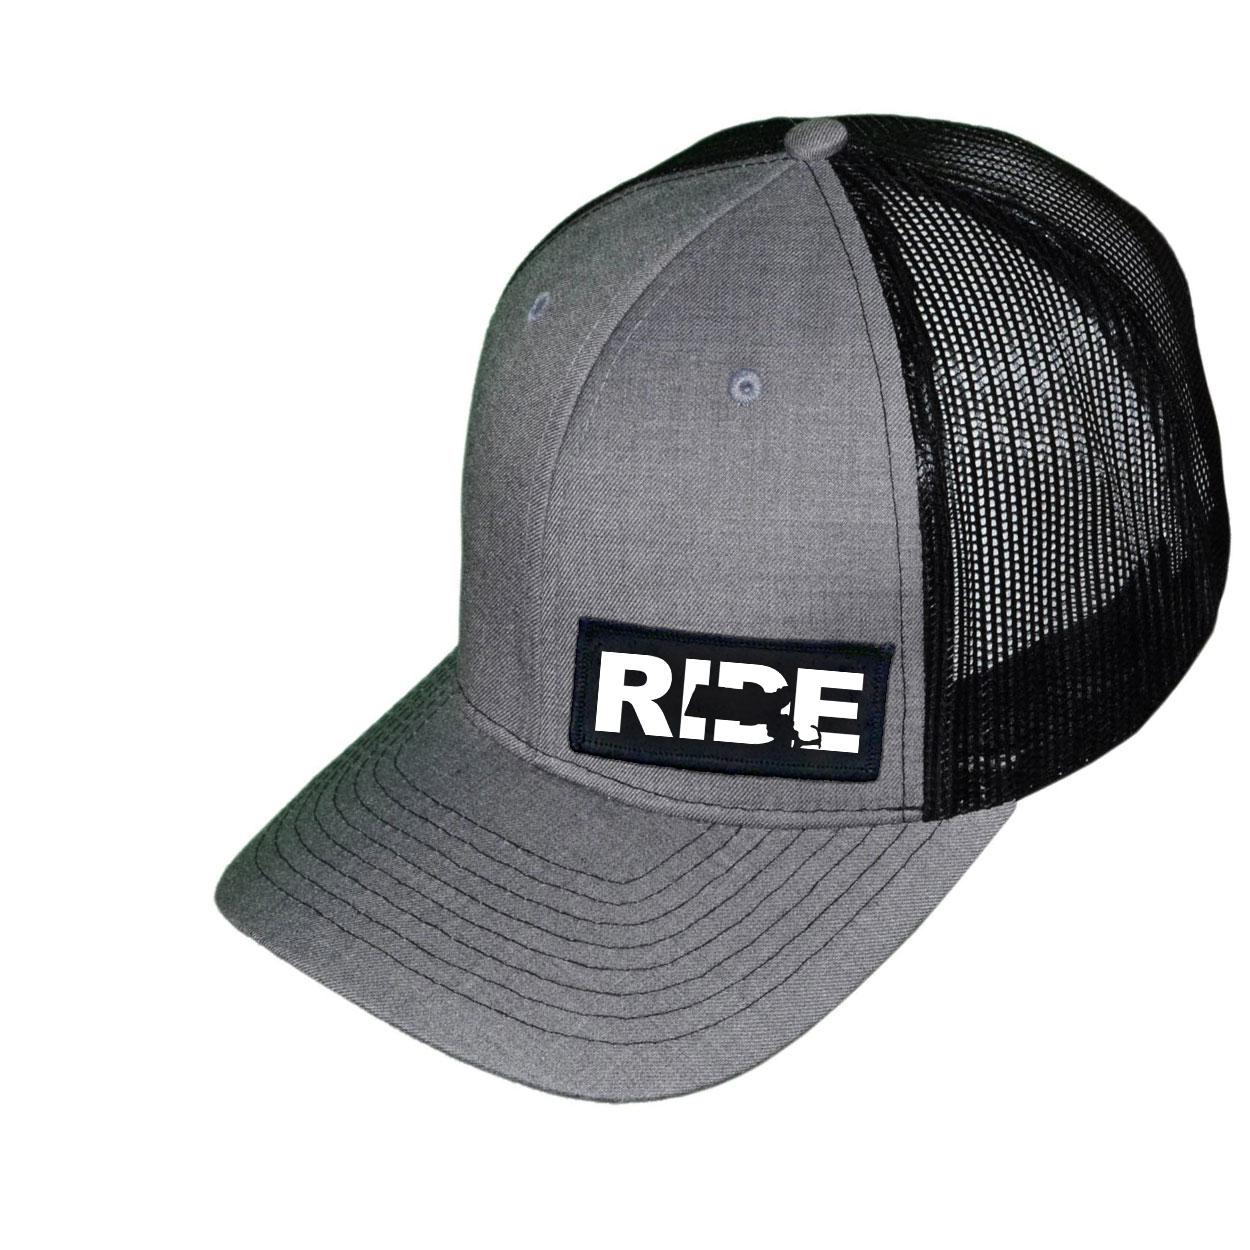 Ride Massachusetts Night Out Woven Patch Snapback Trucker Hat Heather Gray/Black (White Logo)